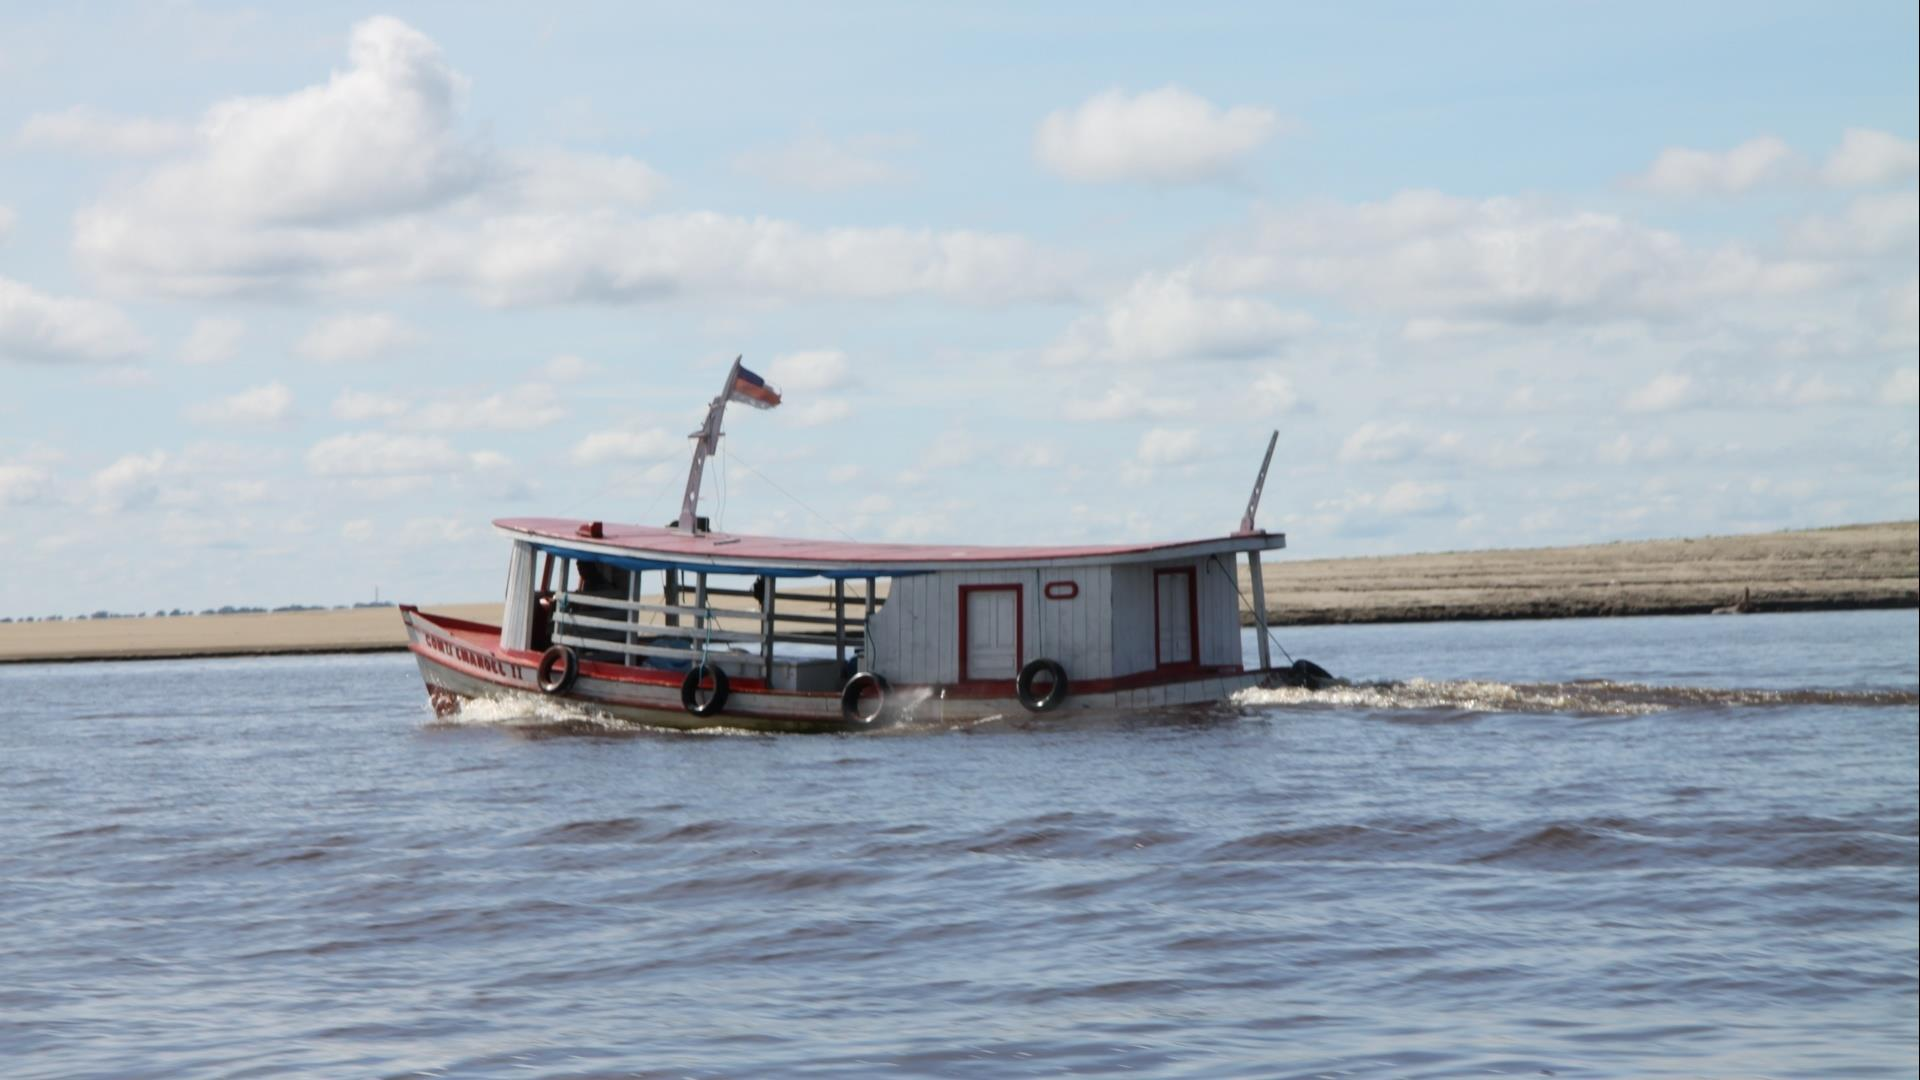 Brasilien Amazonas: 3 Tage Reisebaustein - Schiffsexpedition Jaraqui in Kleingruppe